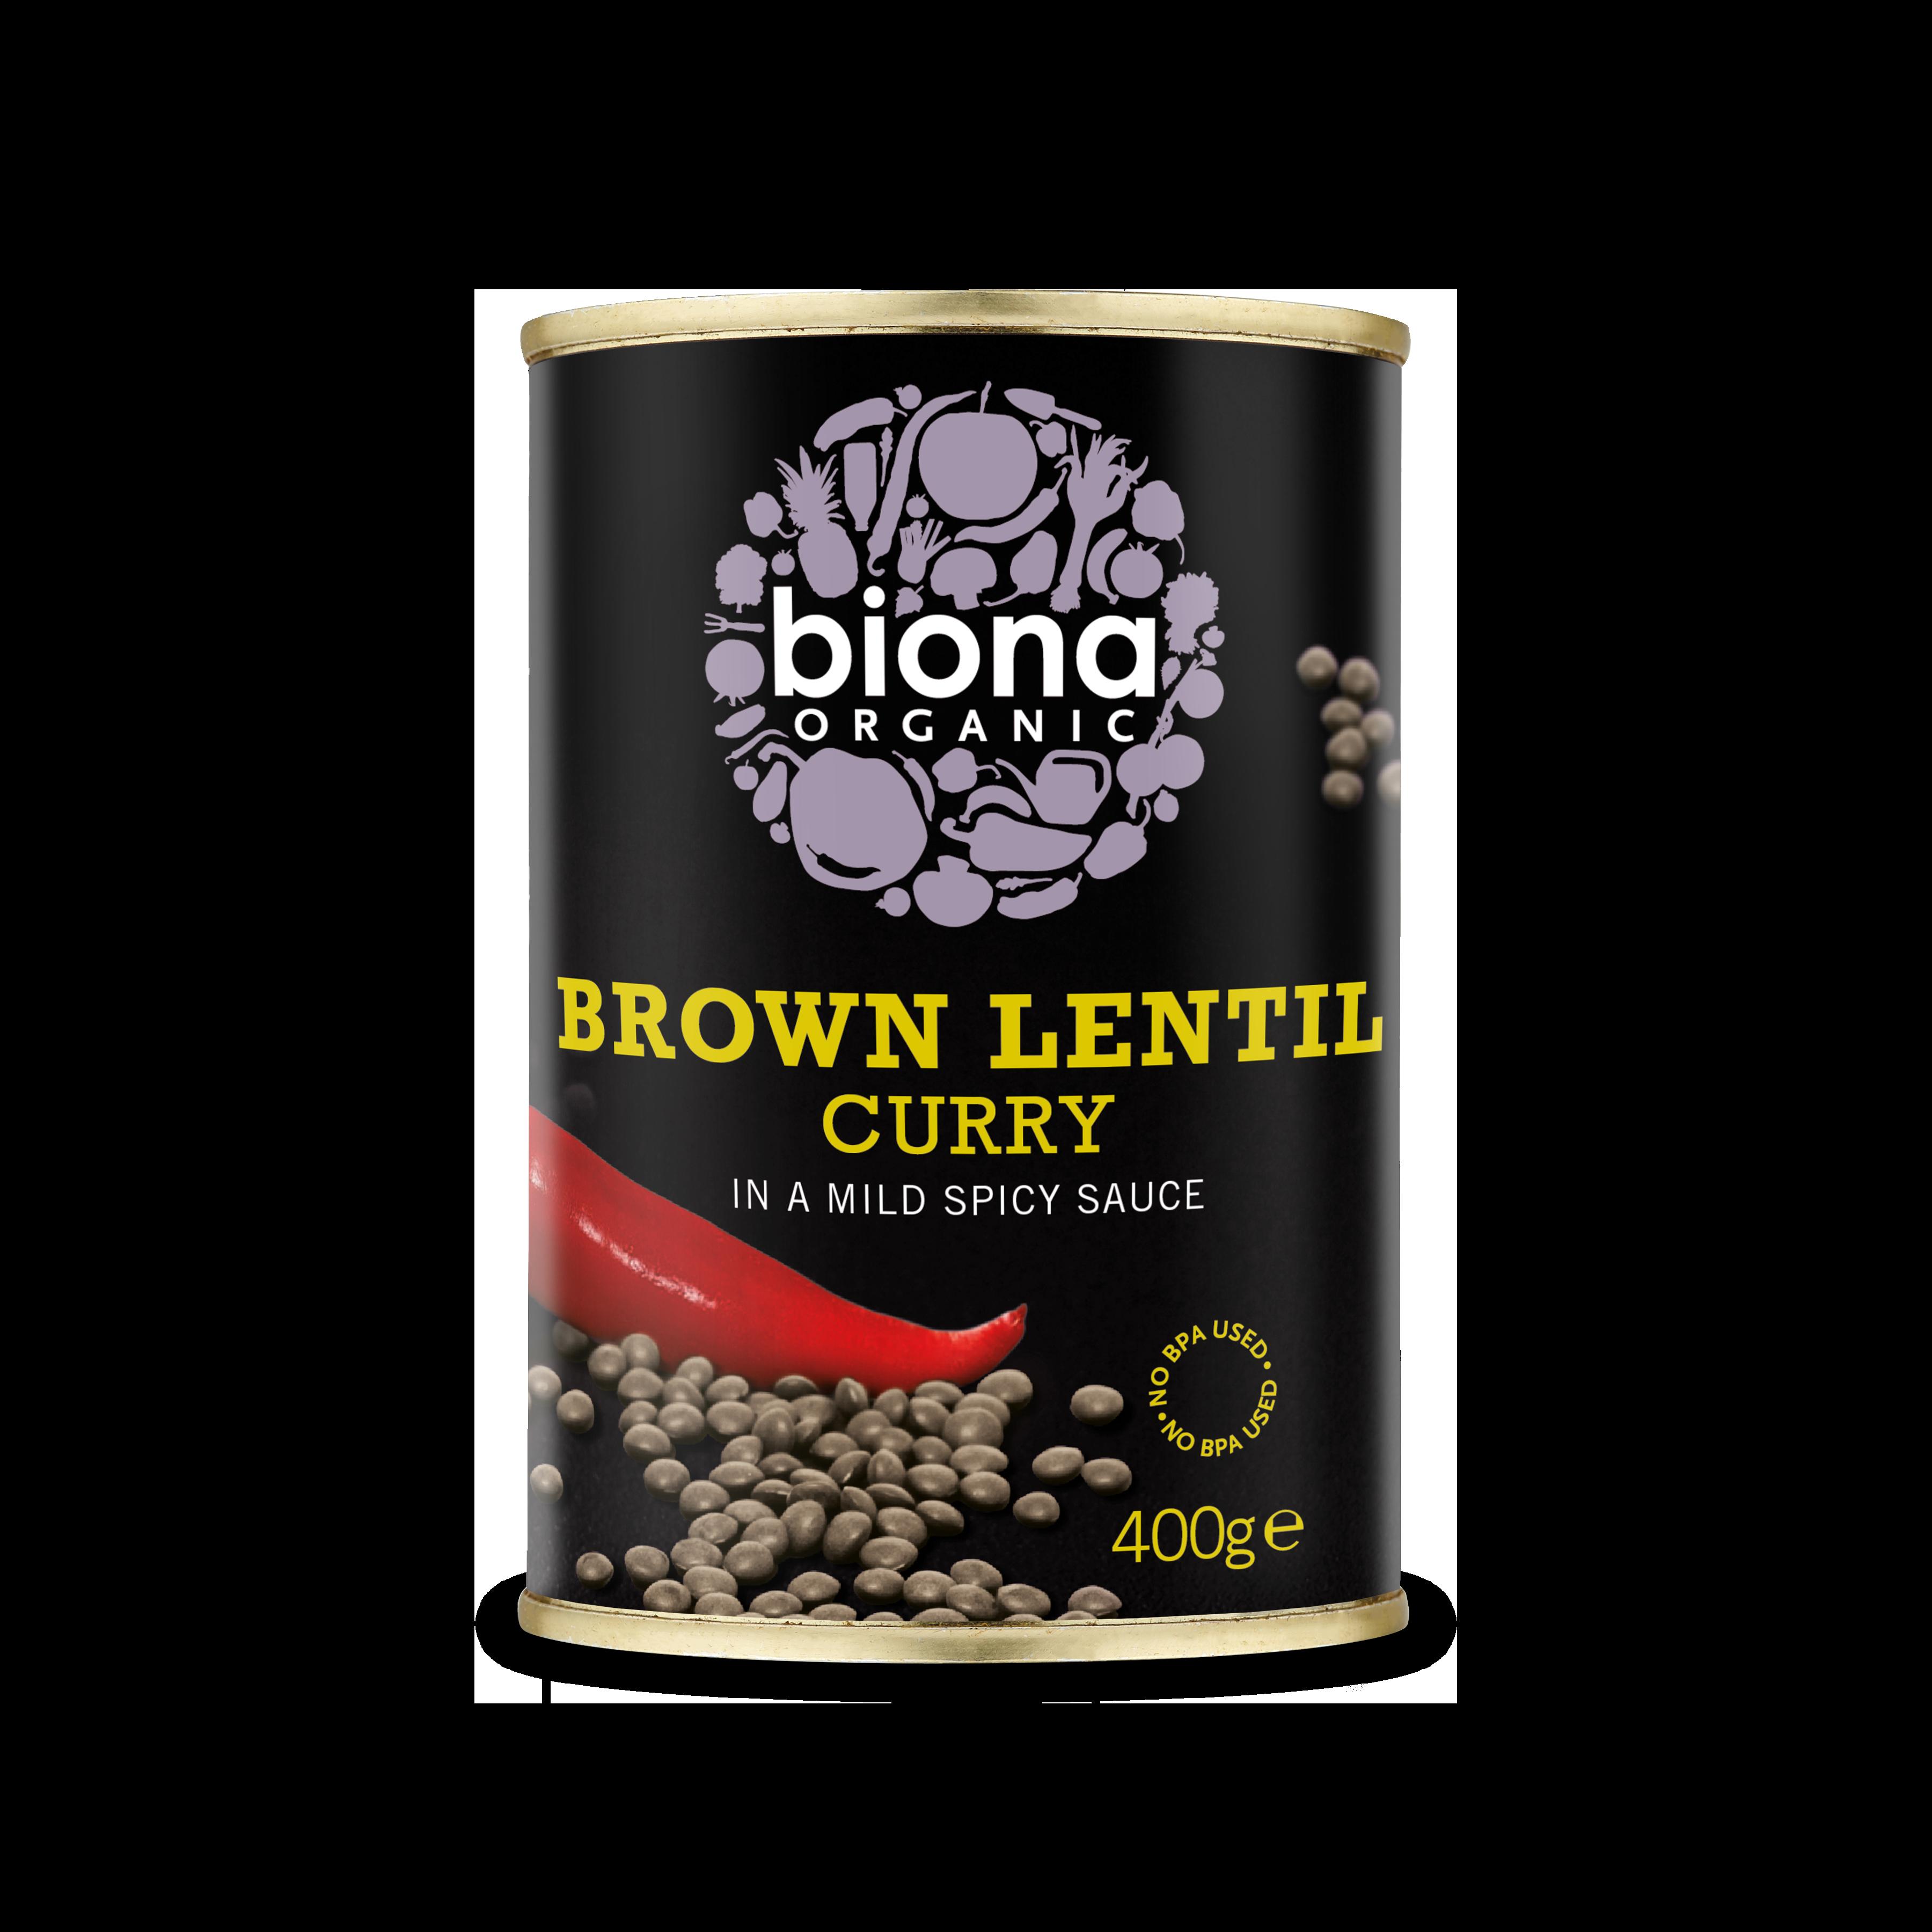 Biona Organic Brown Lentil Curry